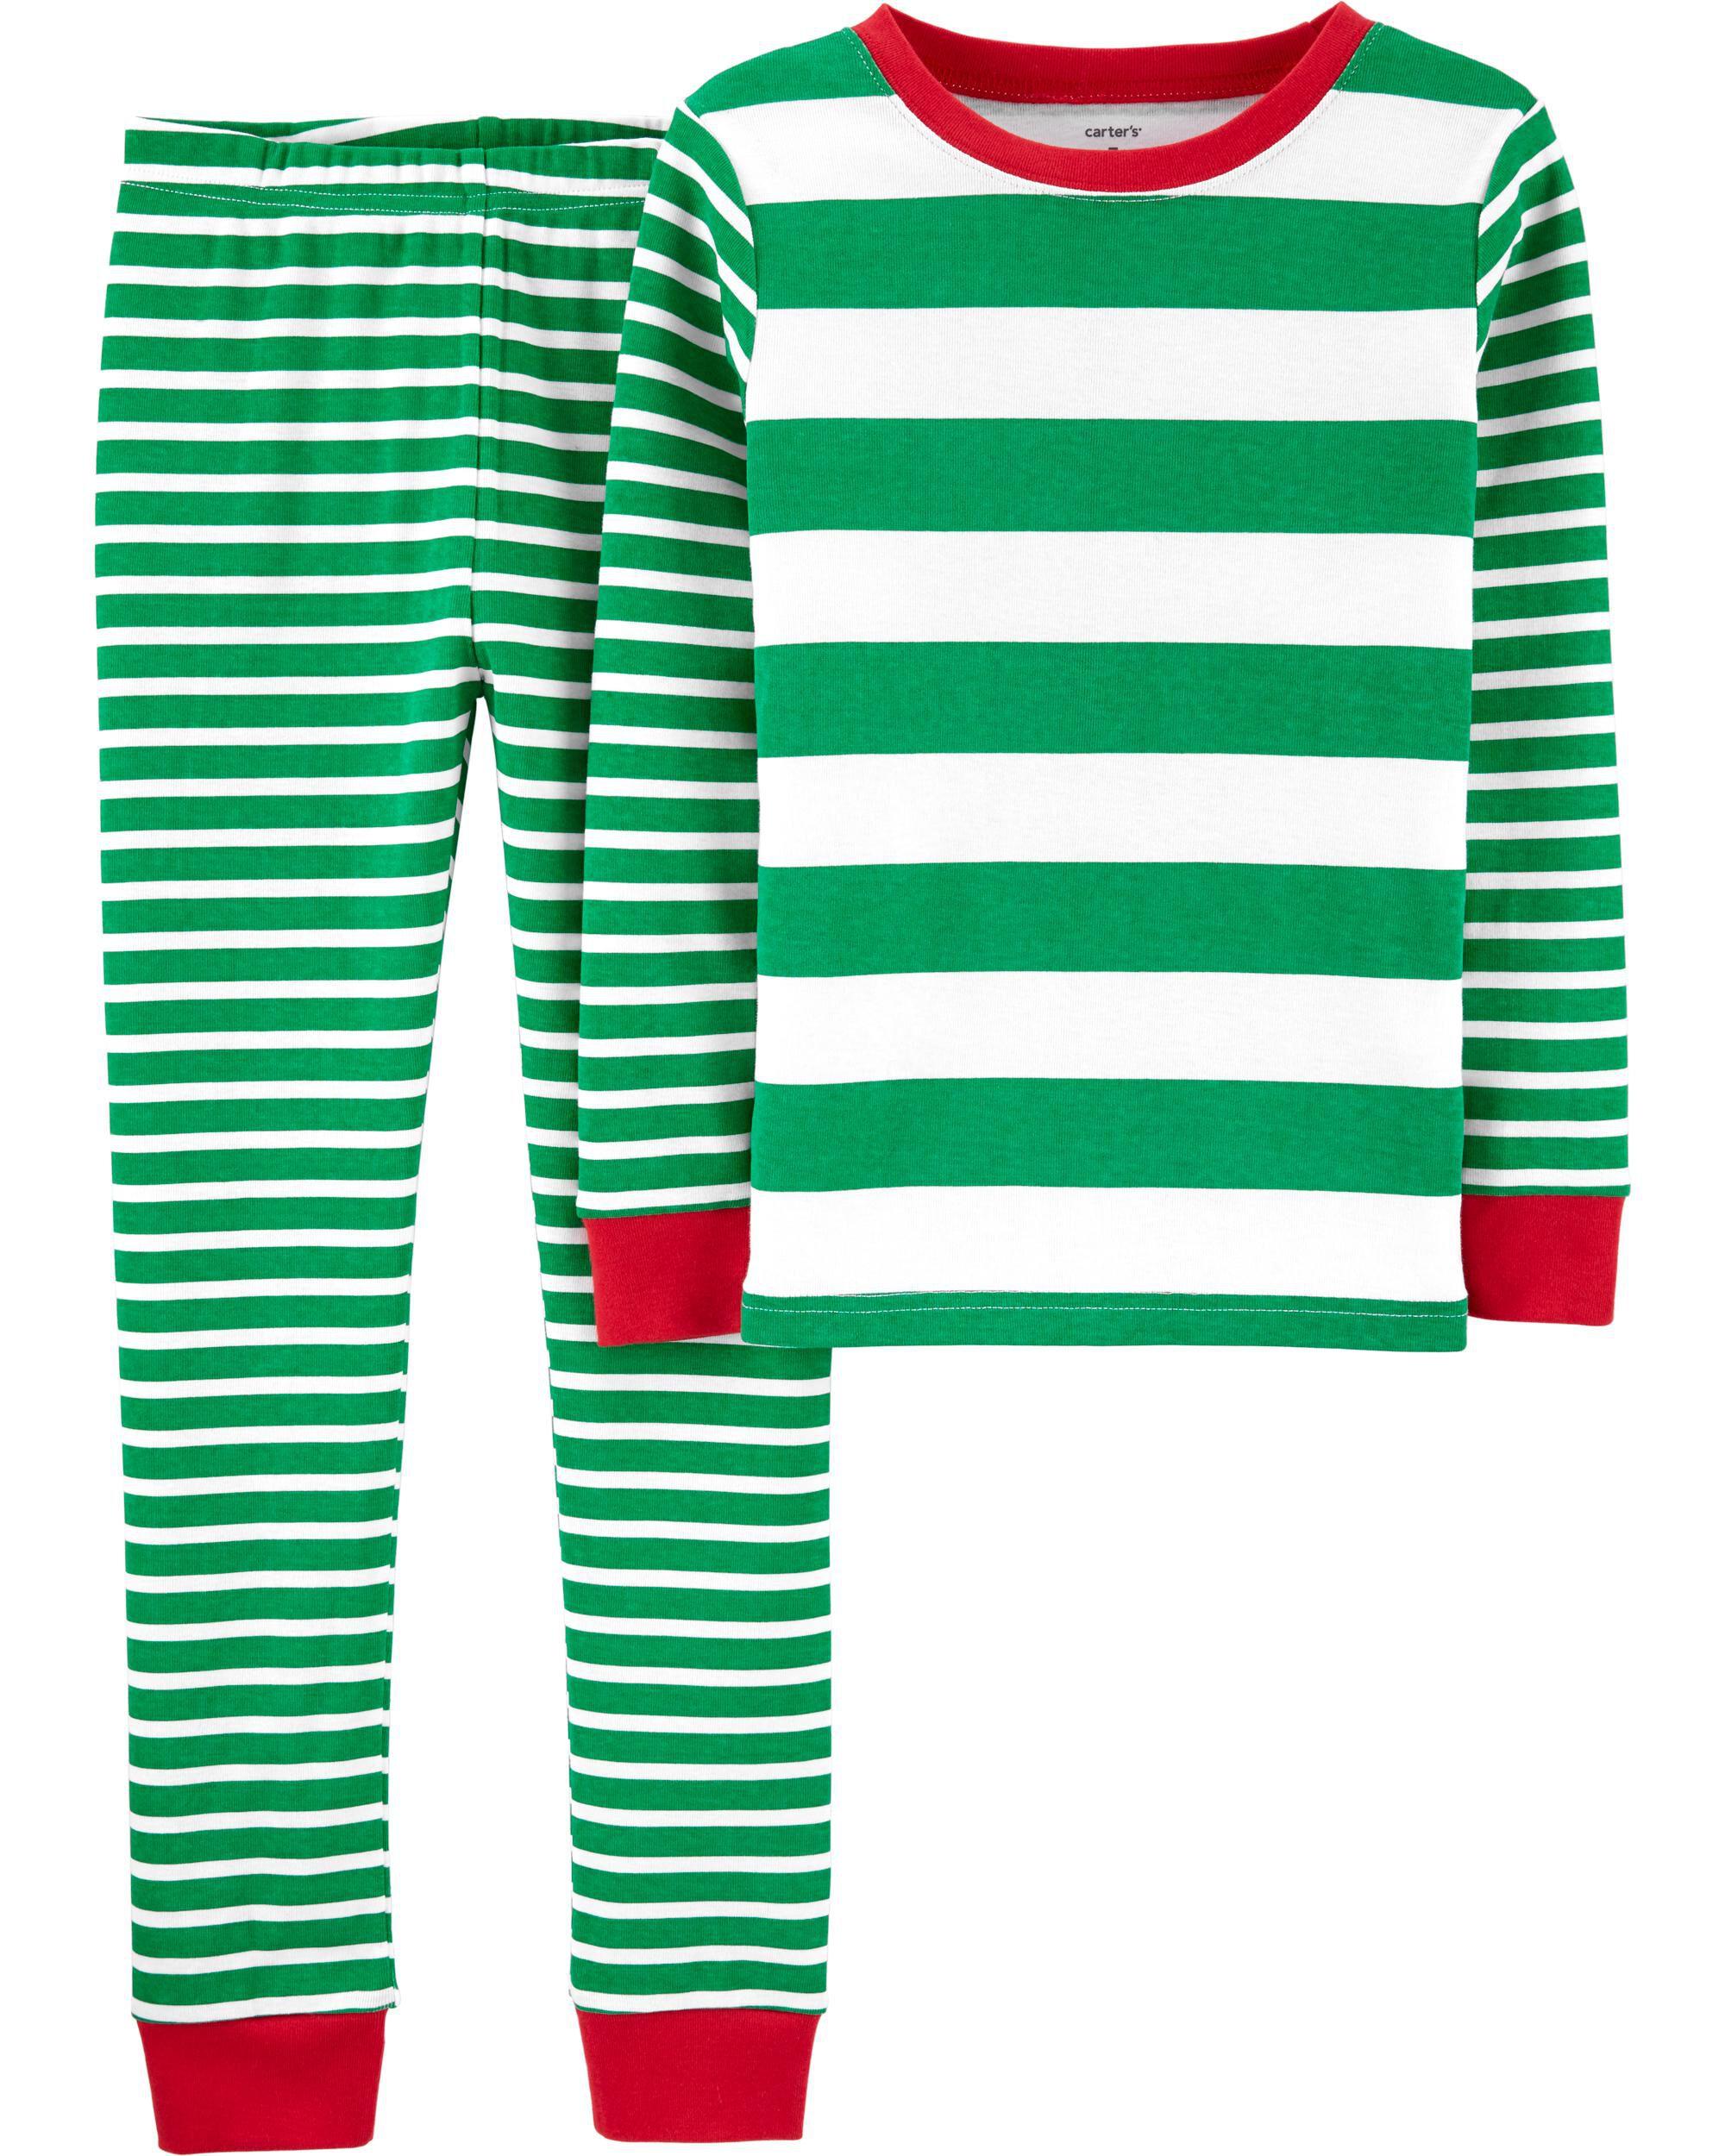 *DOORBUSTER* 2-Piece Striped Snug Fit Cotton PJs